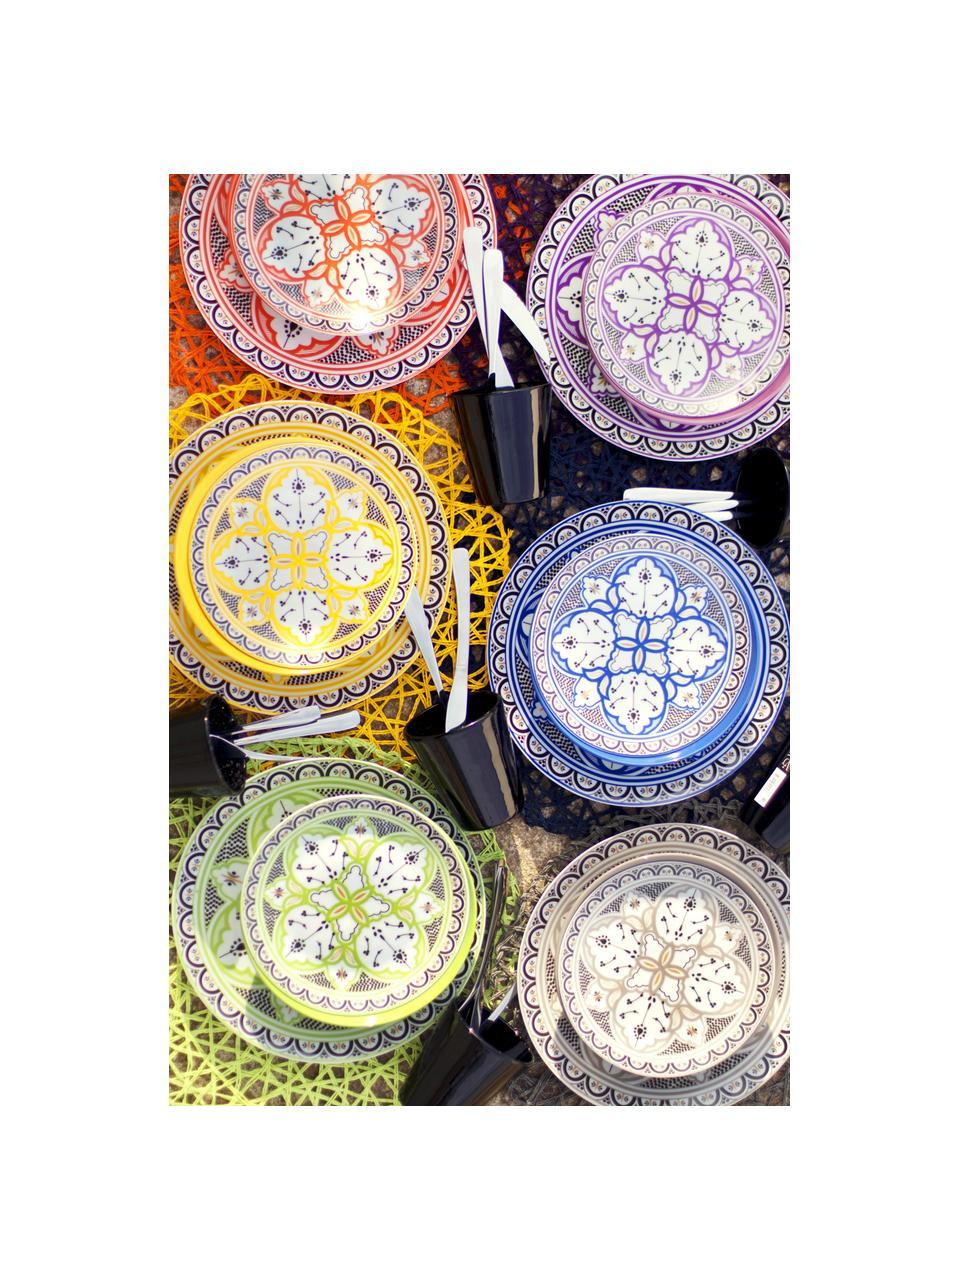 Buntes gemustertes Geschirr-Set Marocco, 6 Personen (18-tlg.), Mehrfarbig, Sondergrößen